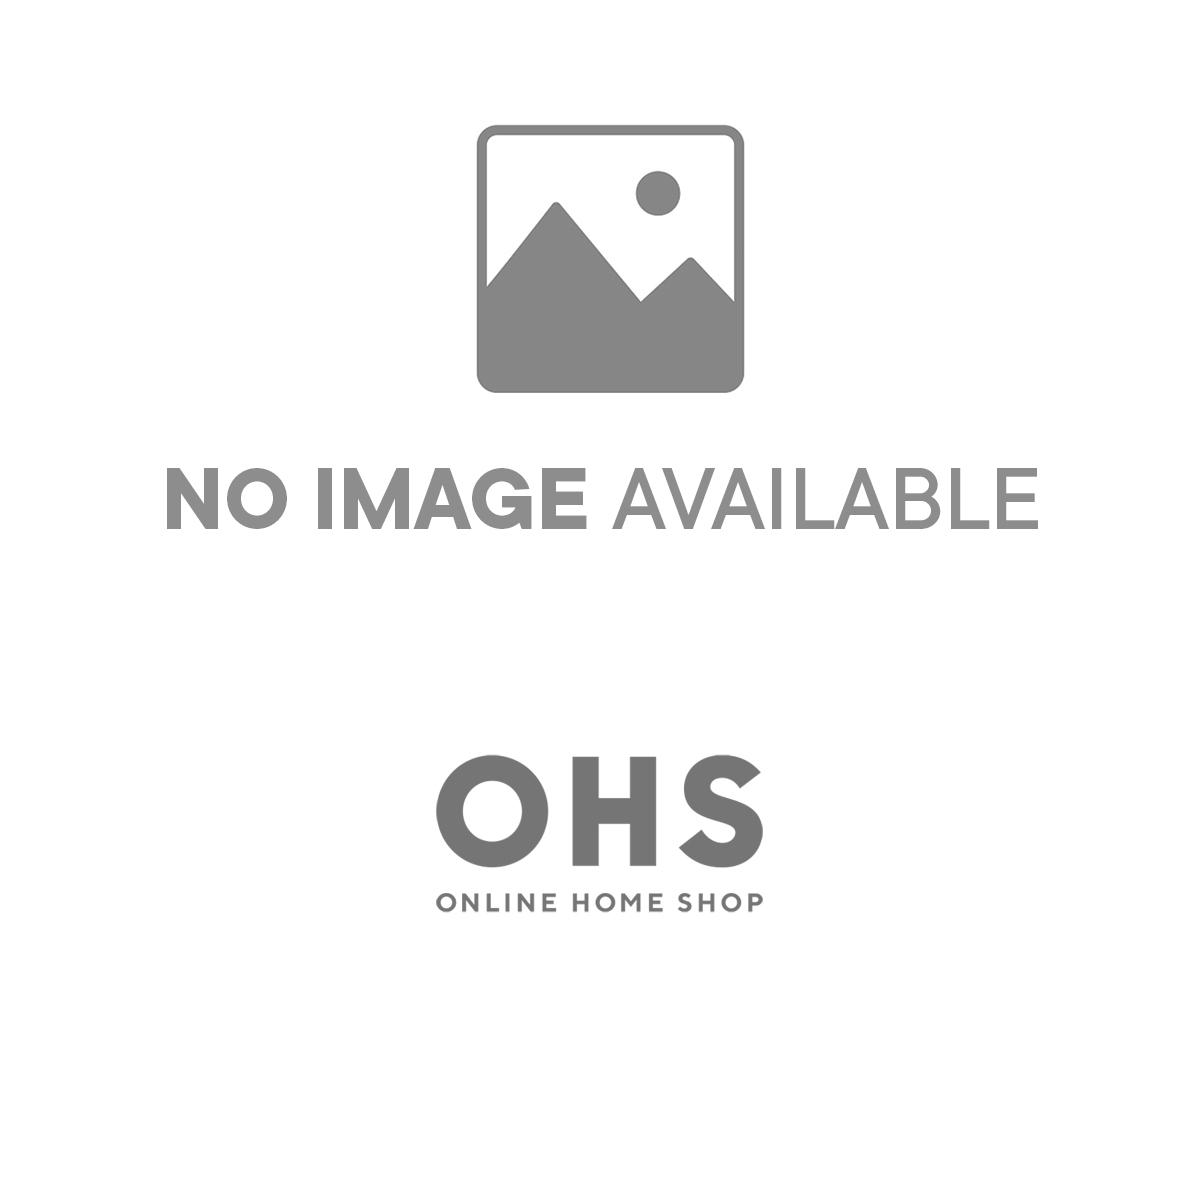 Luxury Super Soft Matt/Satin Fleece Throw Blanket 150x200cm - Chocolate/Caramel